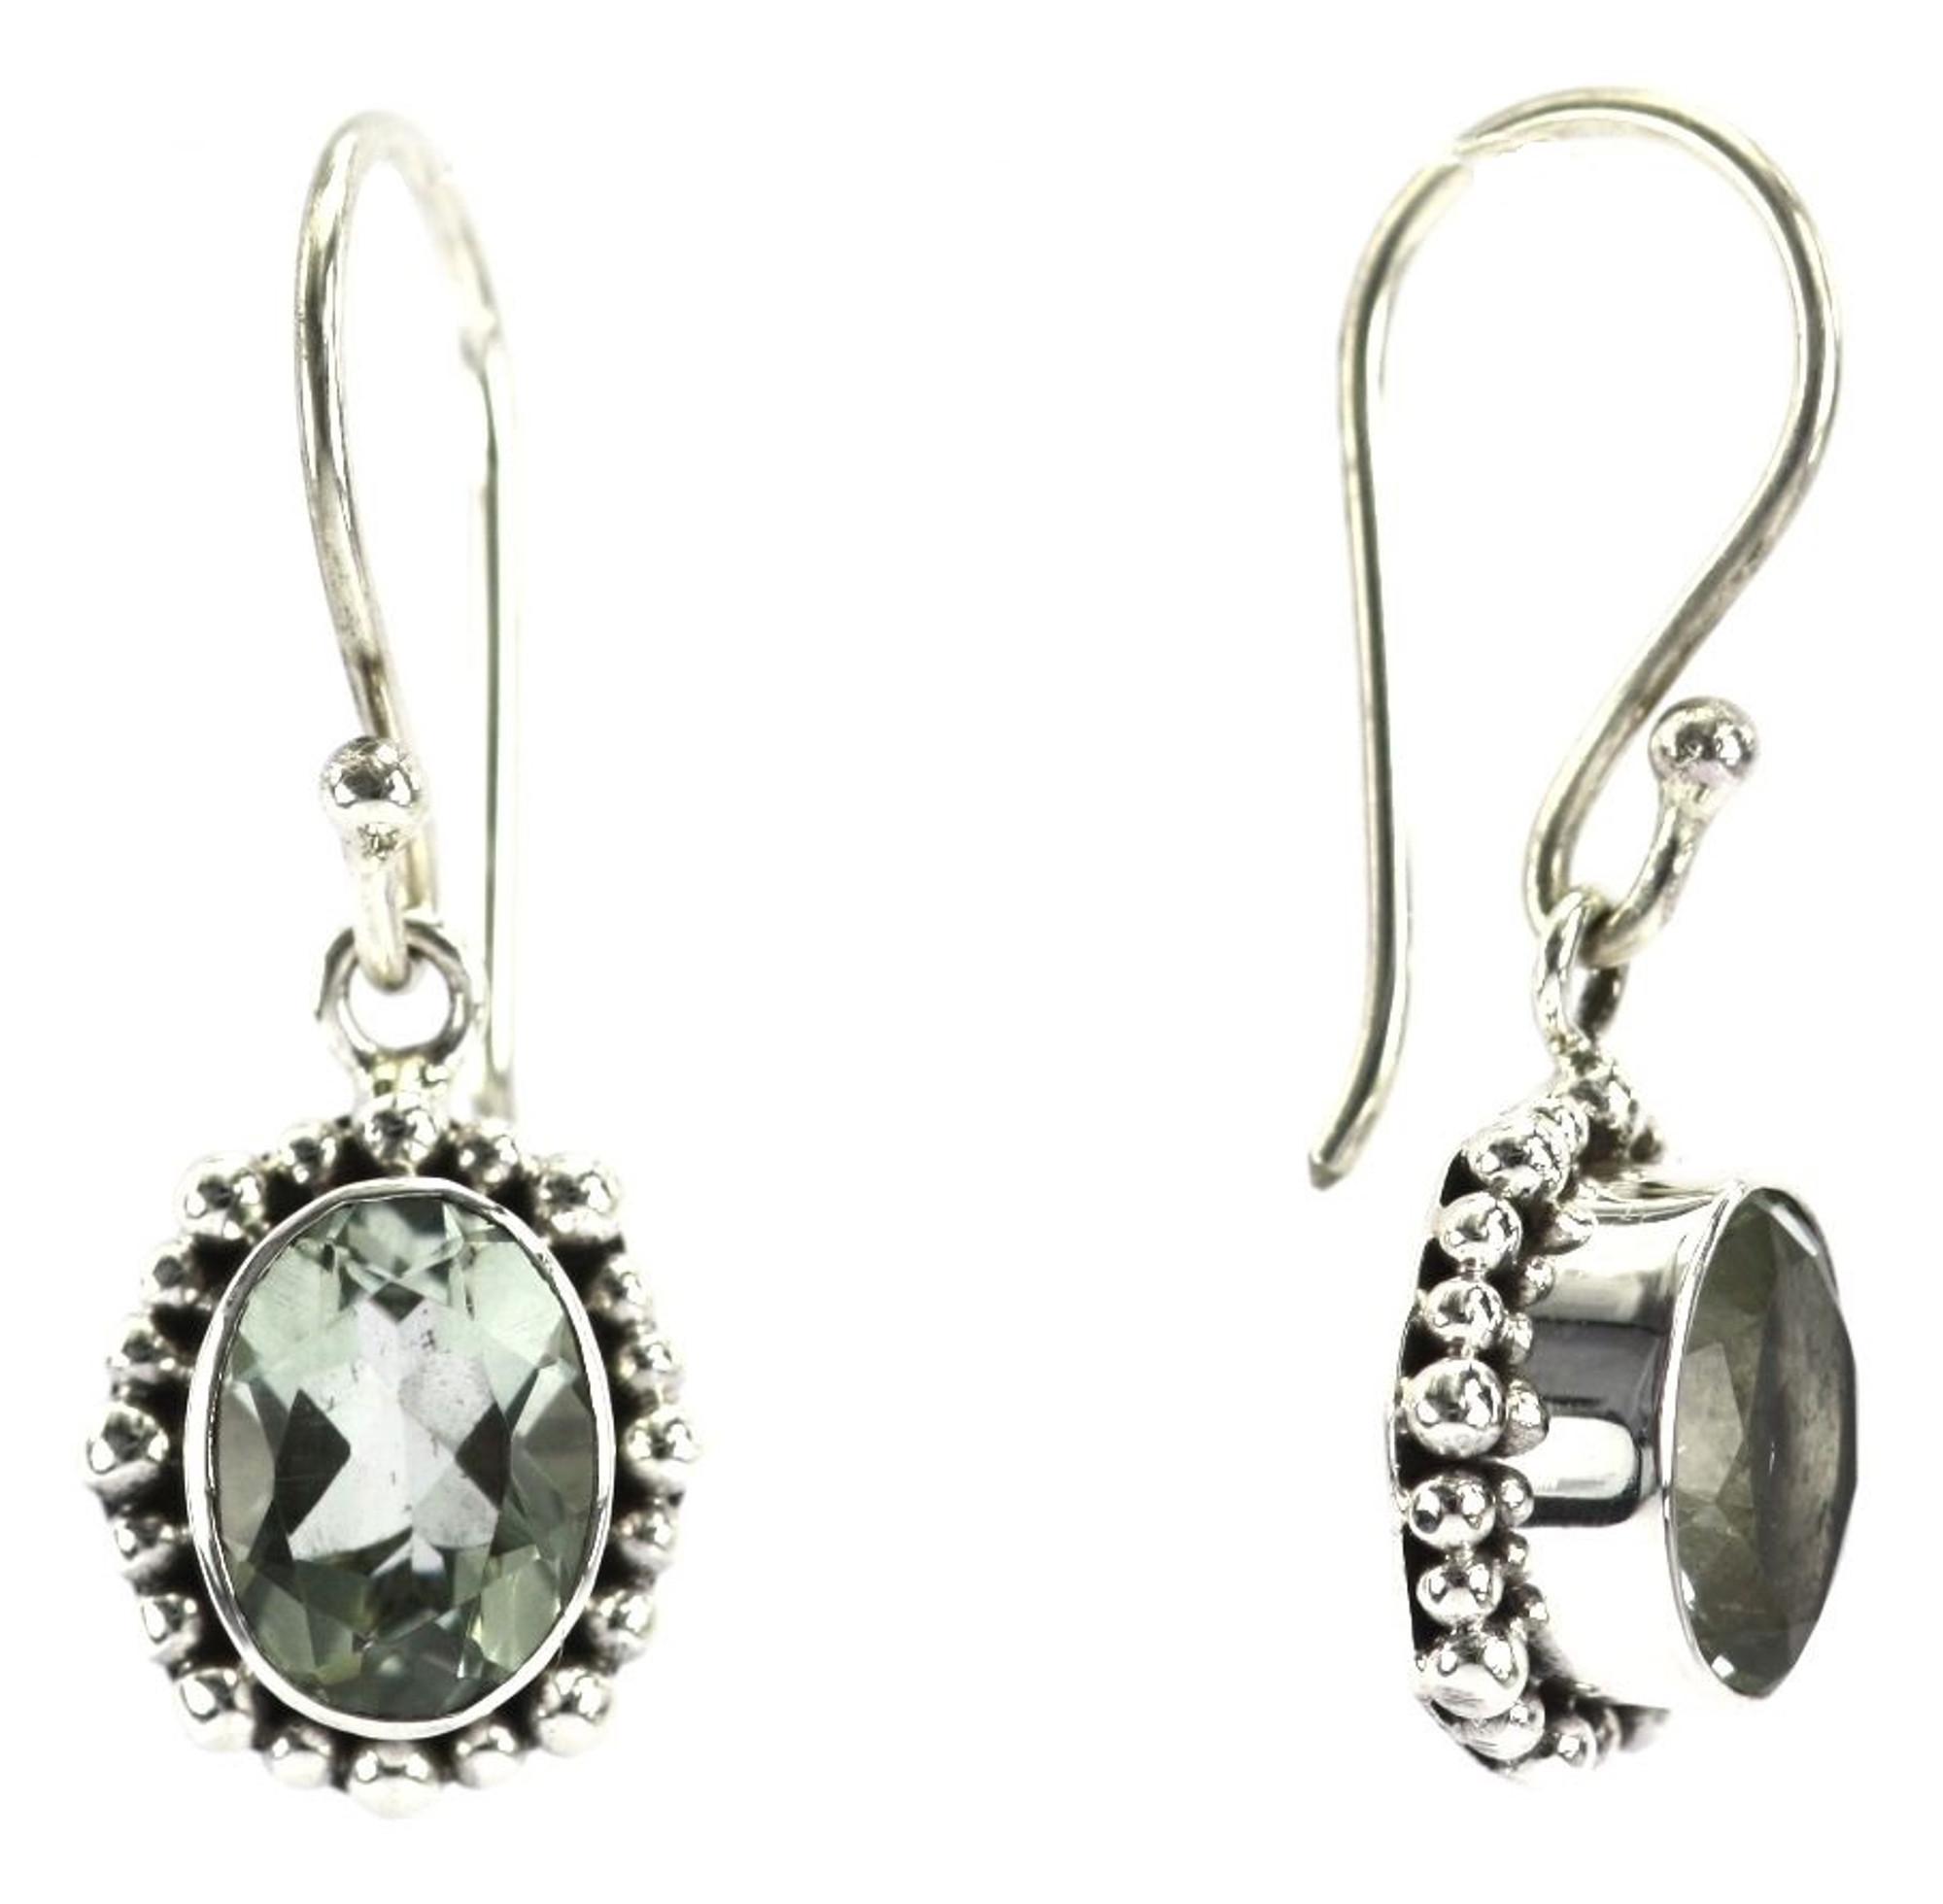 3b25b2c9c Padma Beaded Green Amethyst Oval Drop Earrings - Mima's Of Warwick, LLC